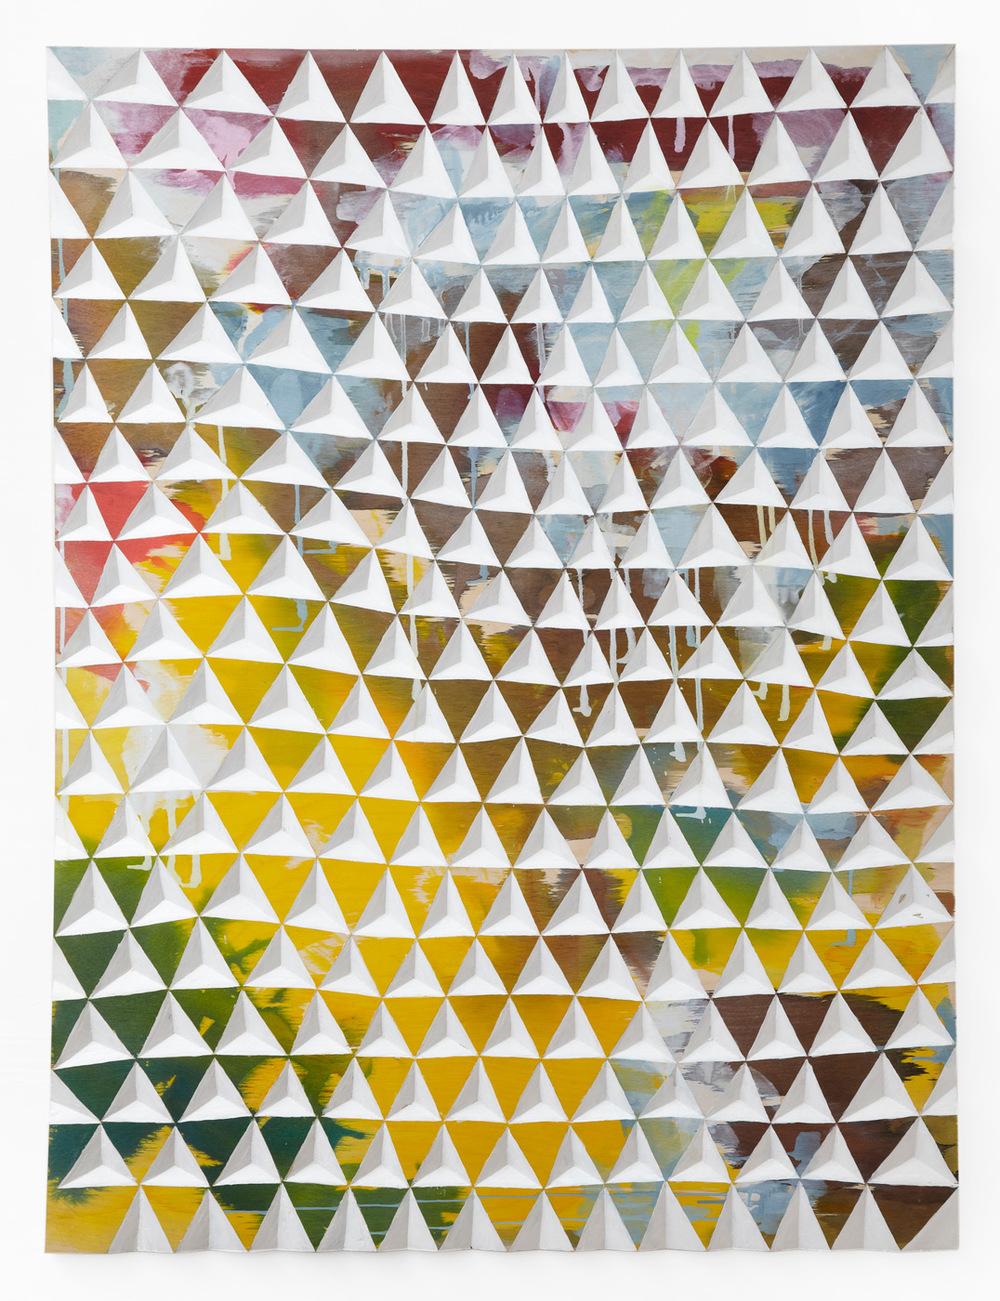 Gerard Mullin, Untitled, 2013, watercolor, wood dye acrylic on wood, 48 x 35 3/4 inches